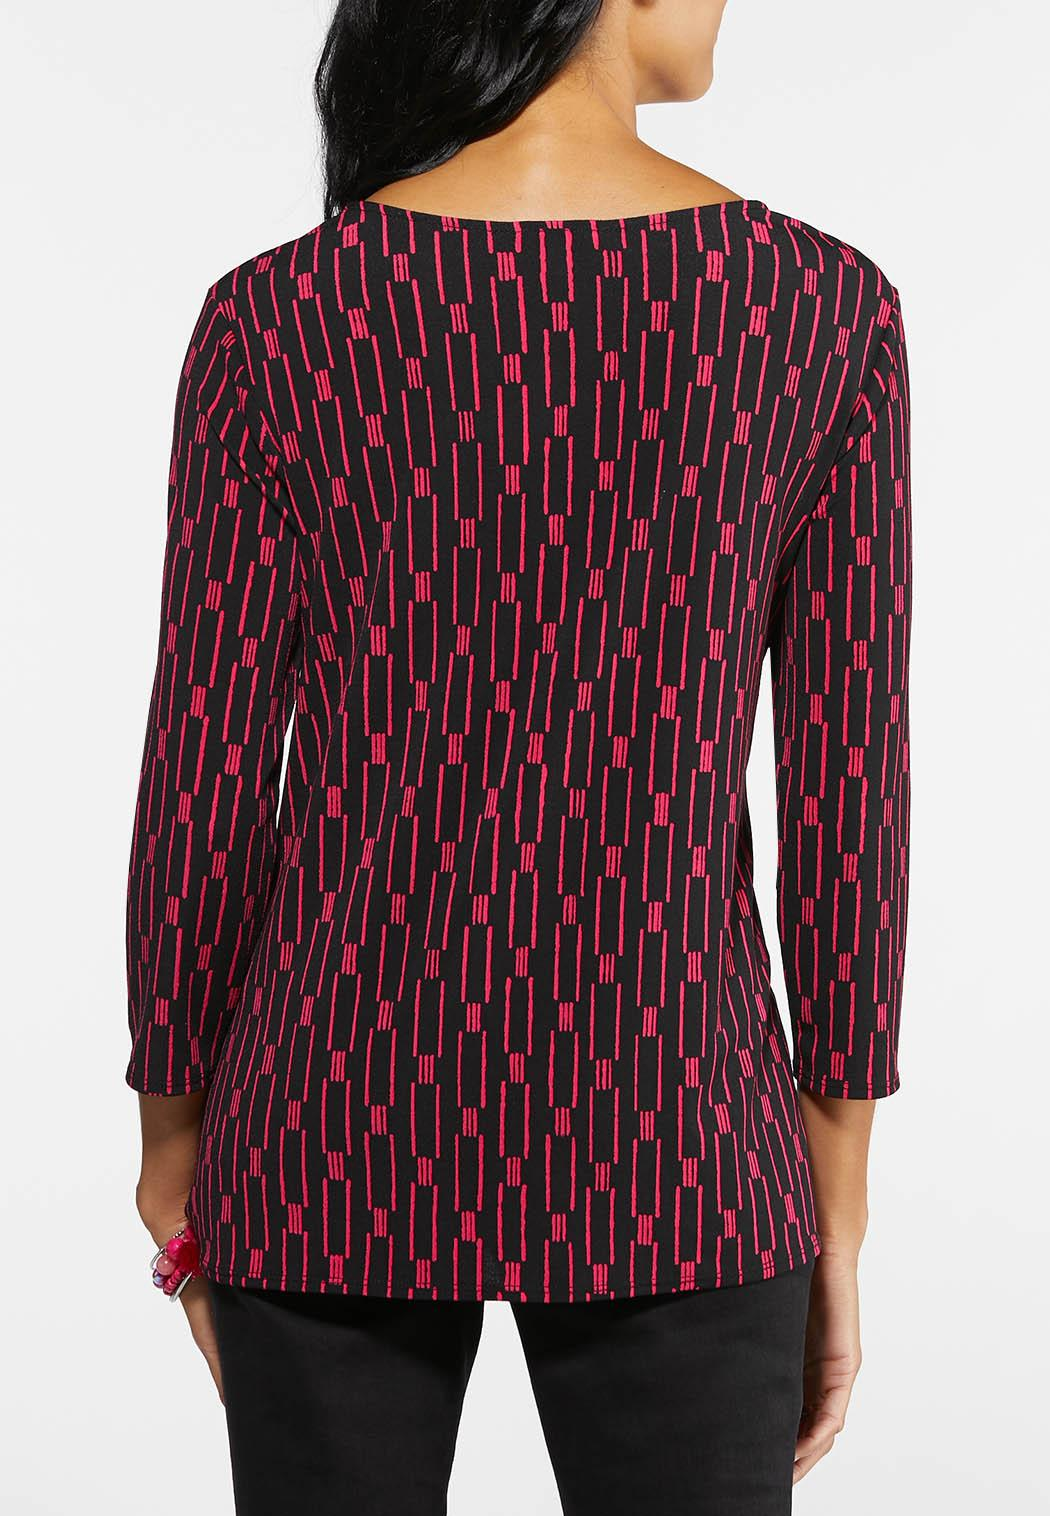 Plus Size Pink Print Tie Top (Item #43974515)